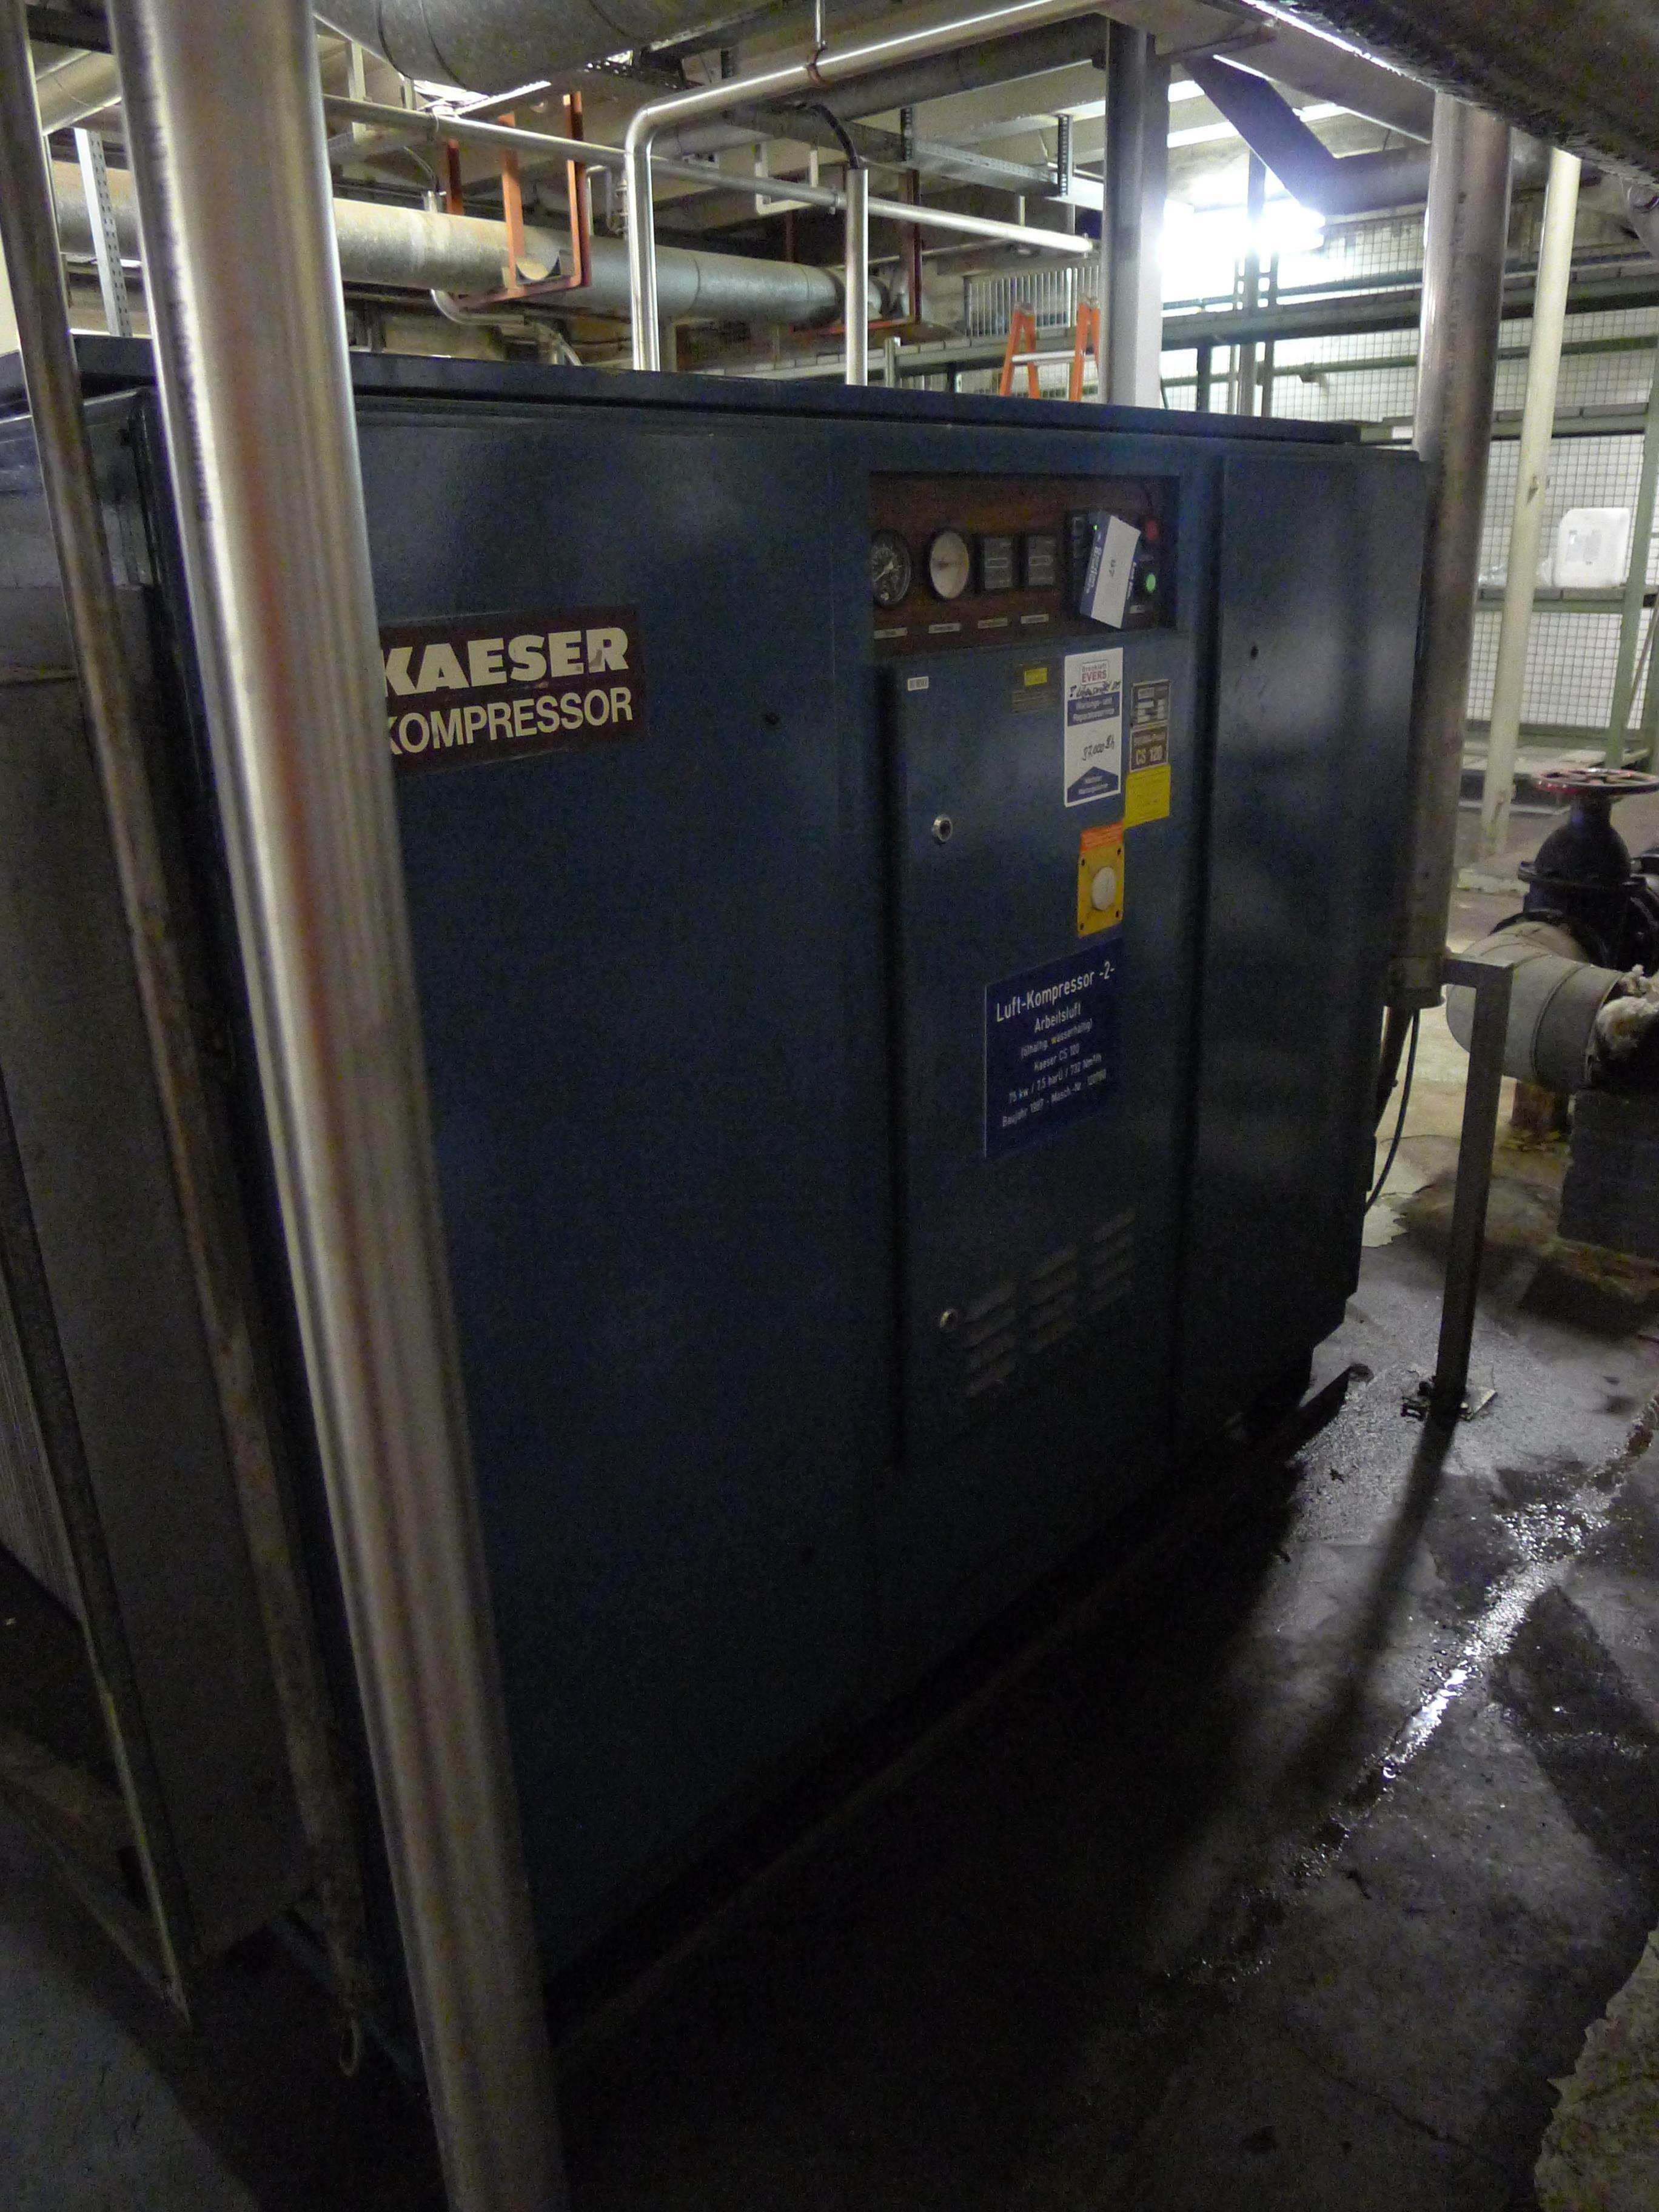 Lot 97 - Kaeser CS120 air compressor. Serial number 120766 (1989) (Dismantling and Loading Fee: €650)